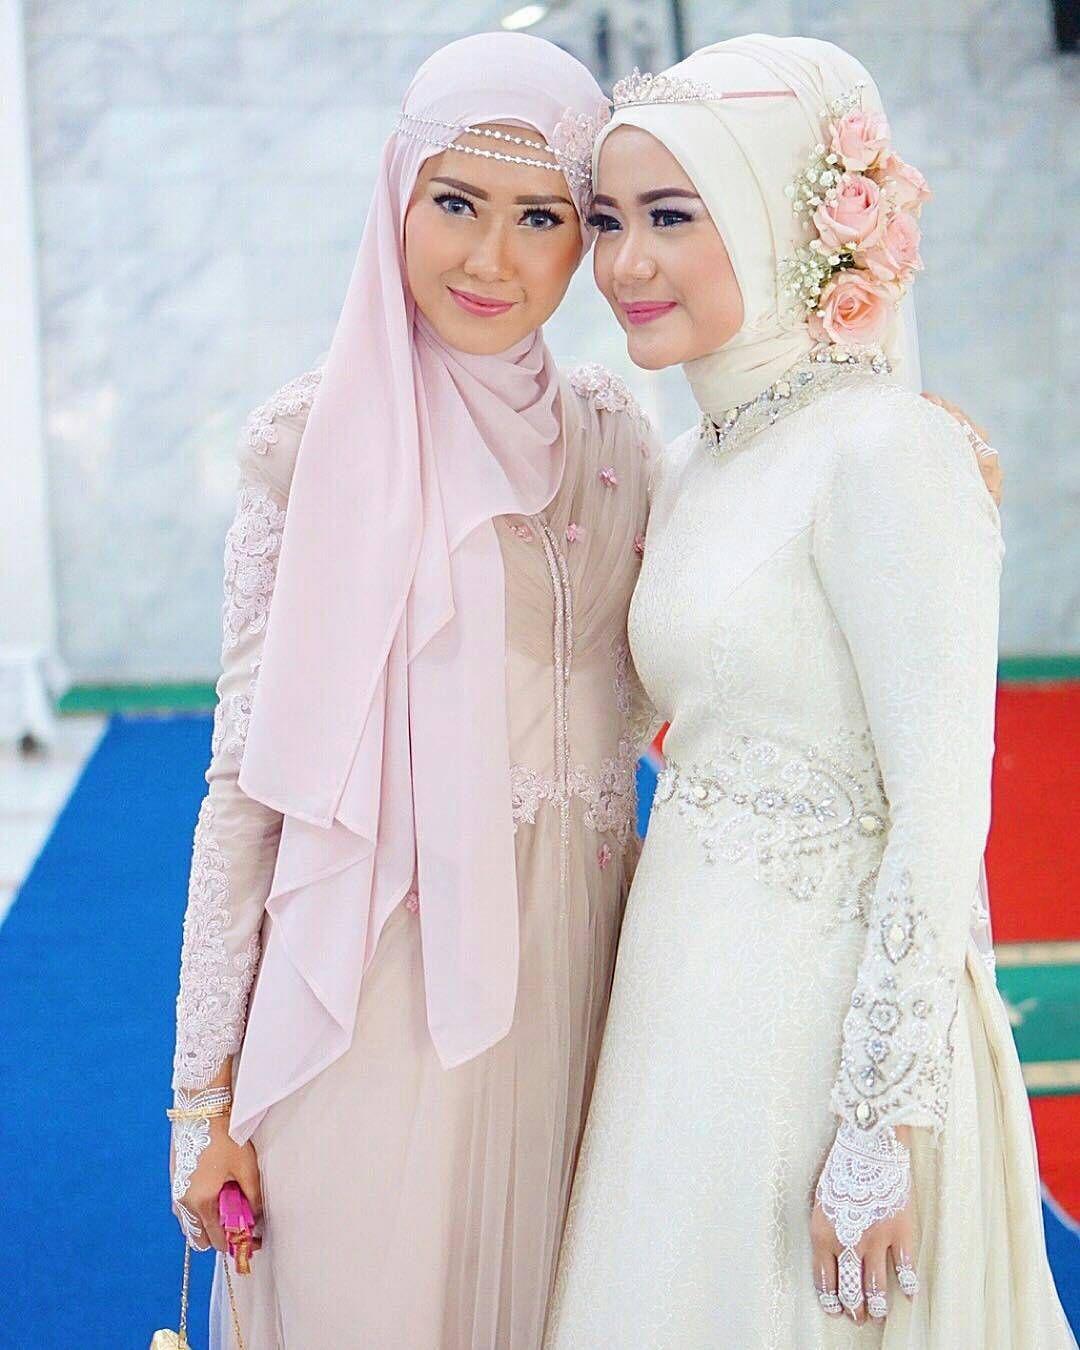 Muslim Wedding Ideas 45k On Instagram We Adore These Two Beautiful Sisters Luluelhasbu And Nuunuelhasbu Congrats Si Gaun Hijab Gaun Model Pakaian Hijab